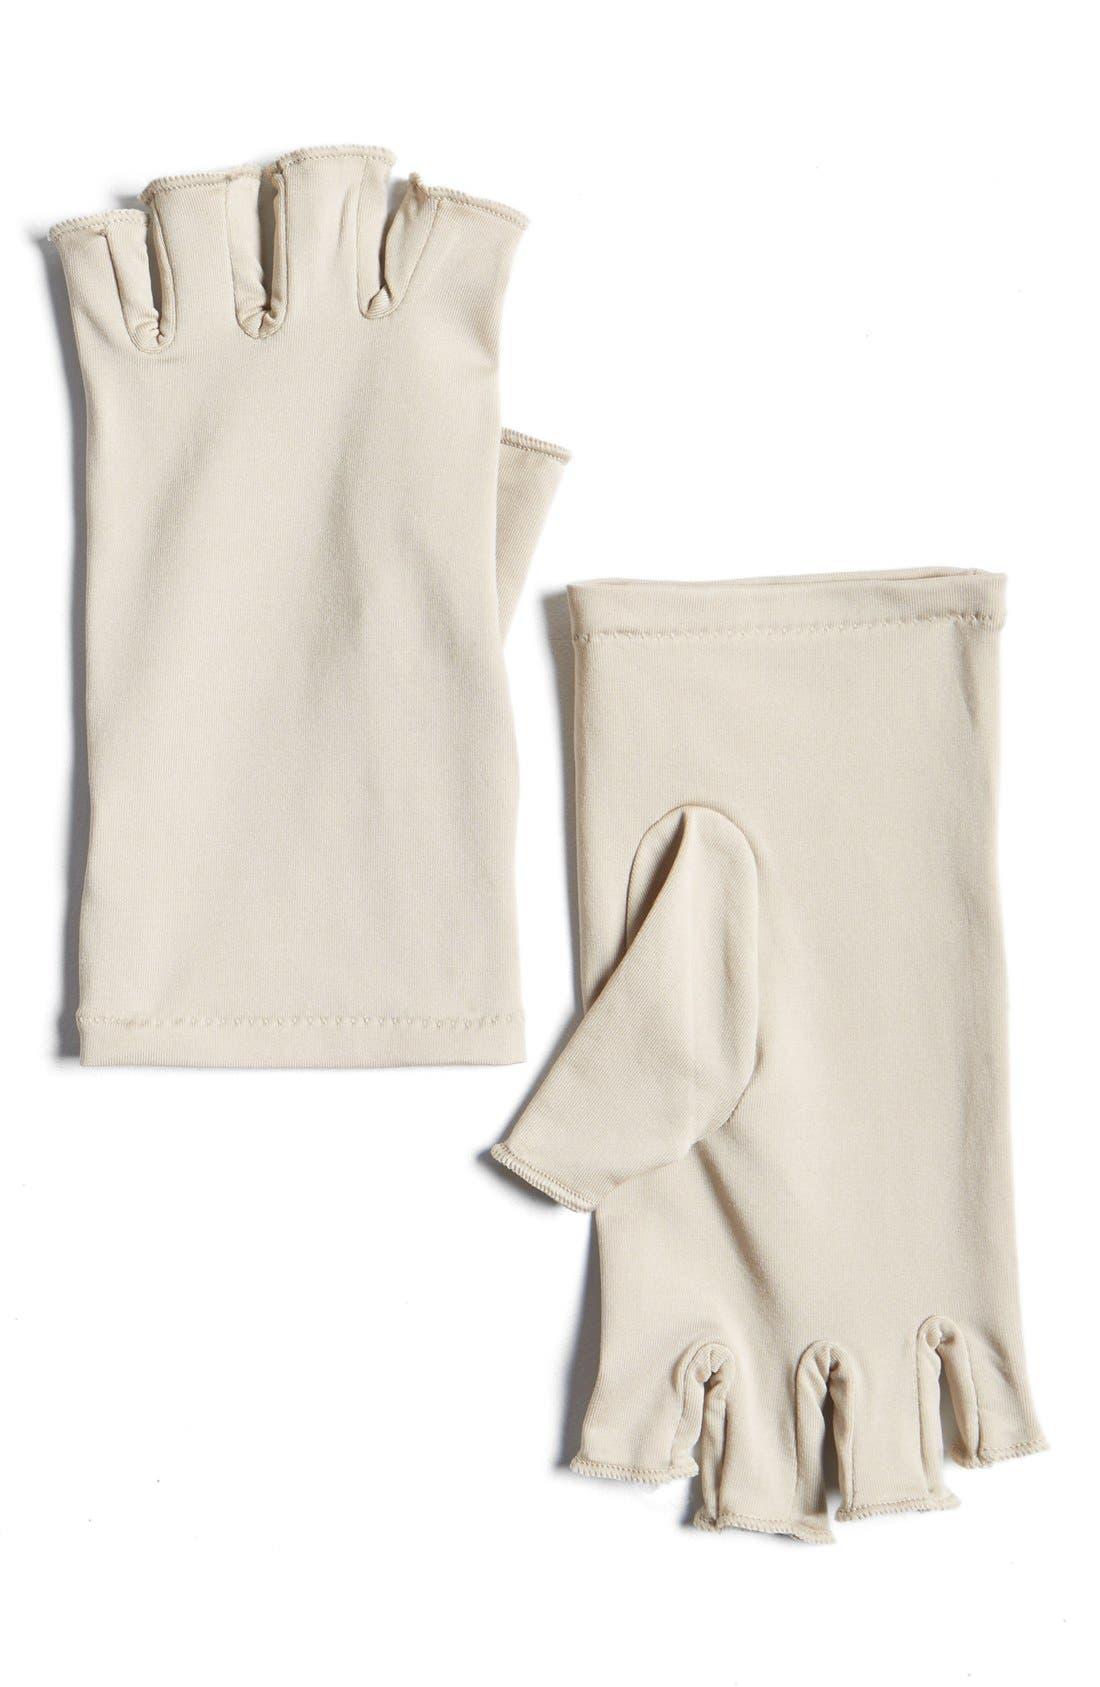 Skin Rejuvenating Gloves,                             Main thumbnail 1, color,                             000